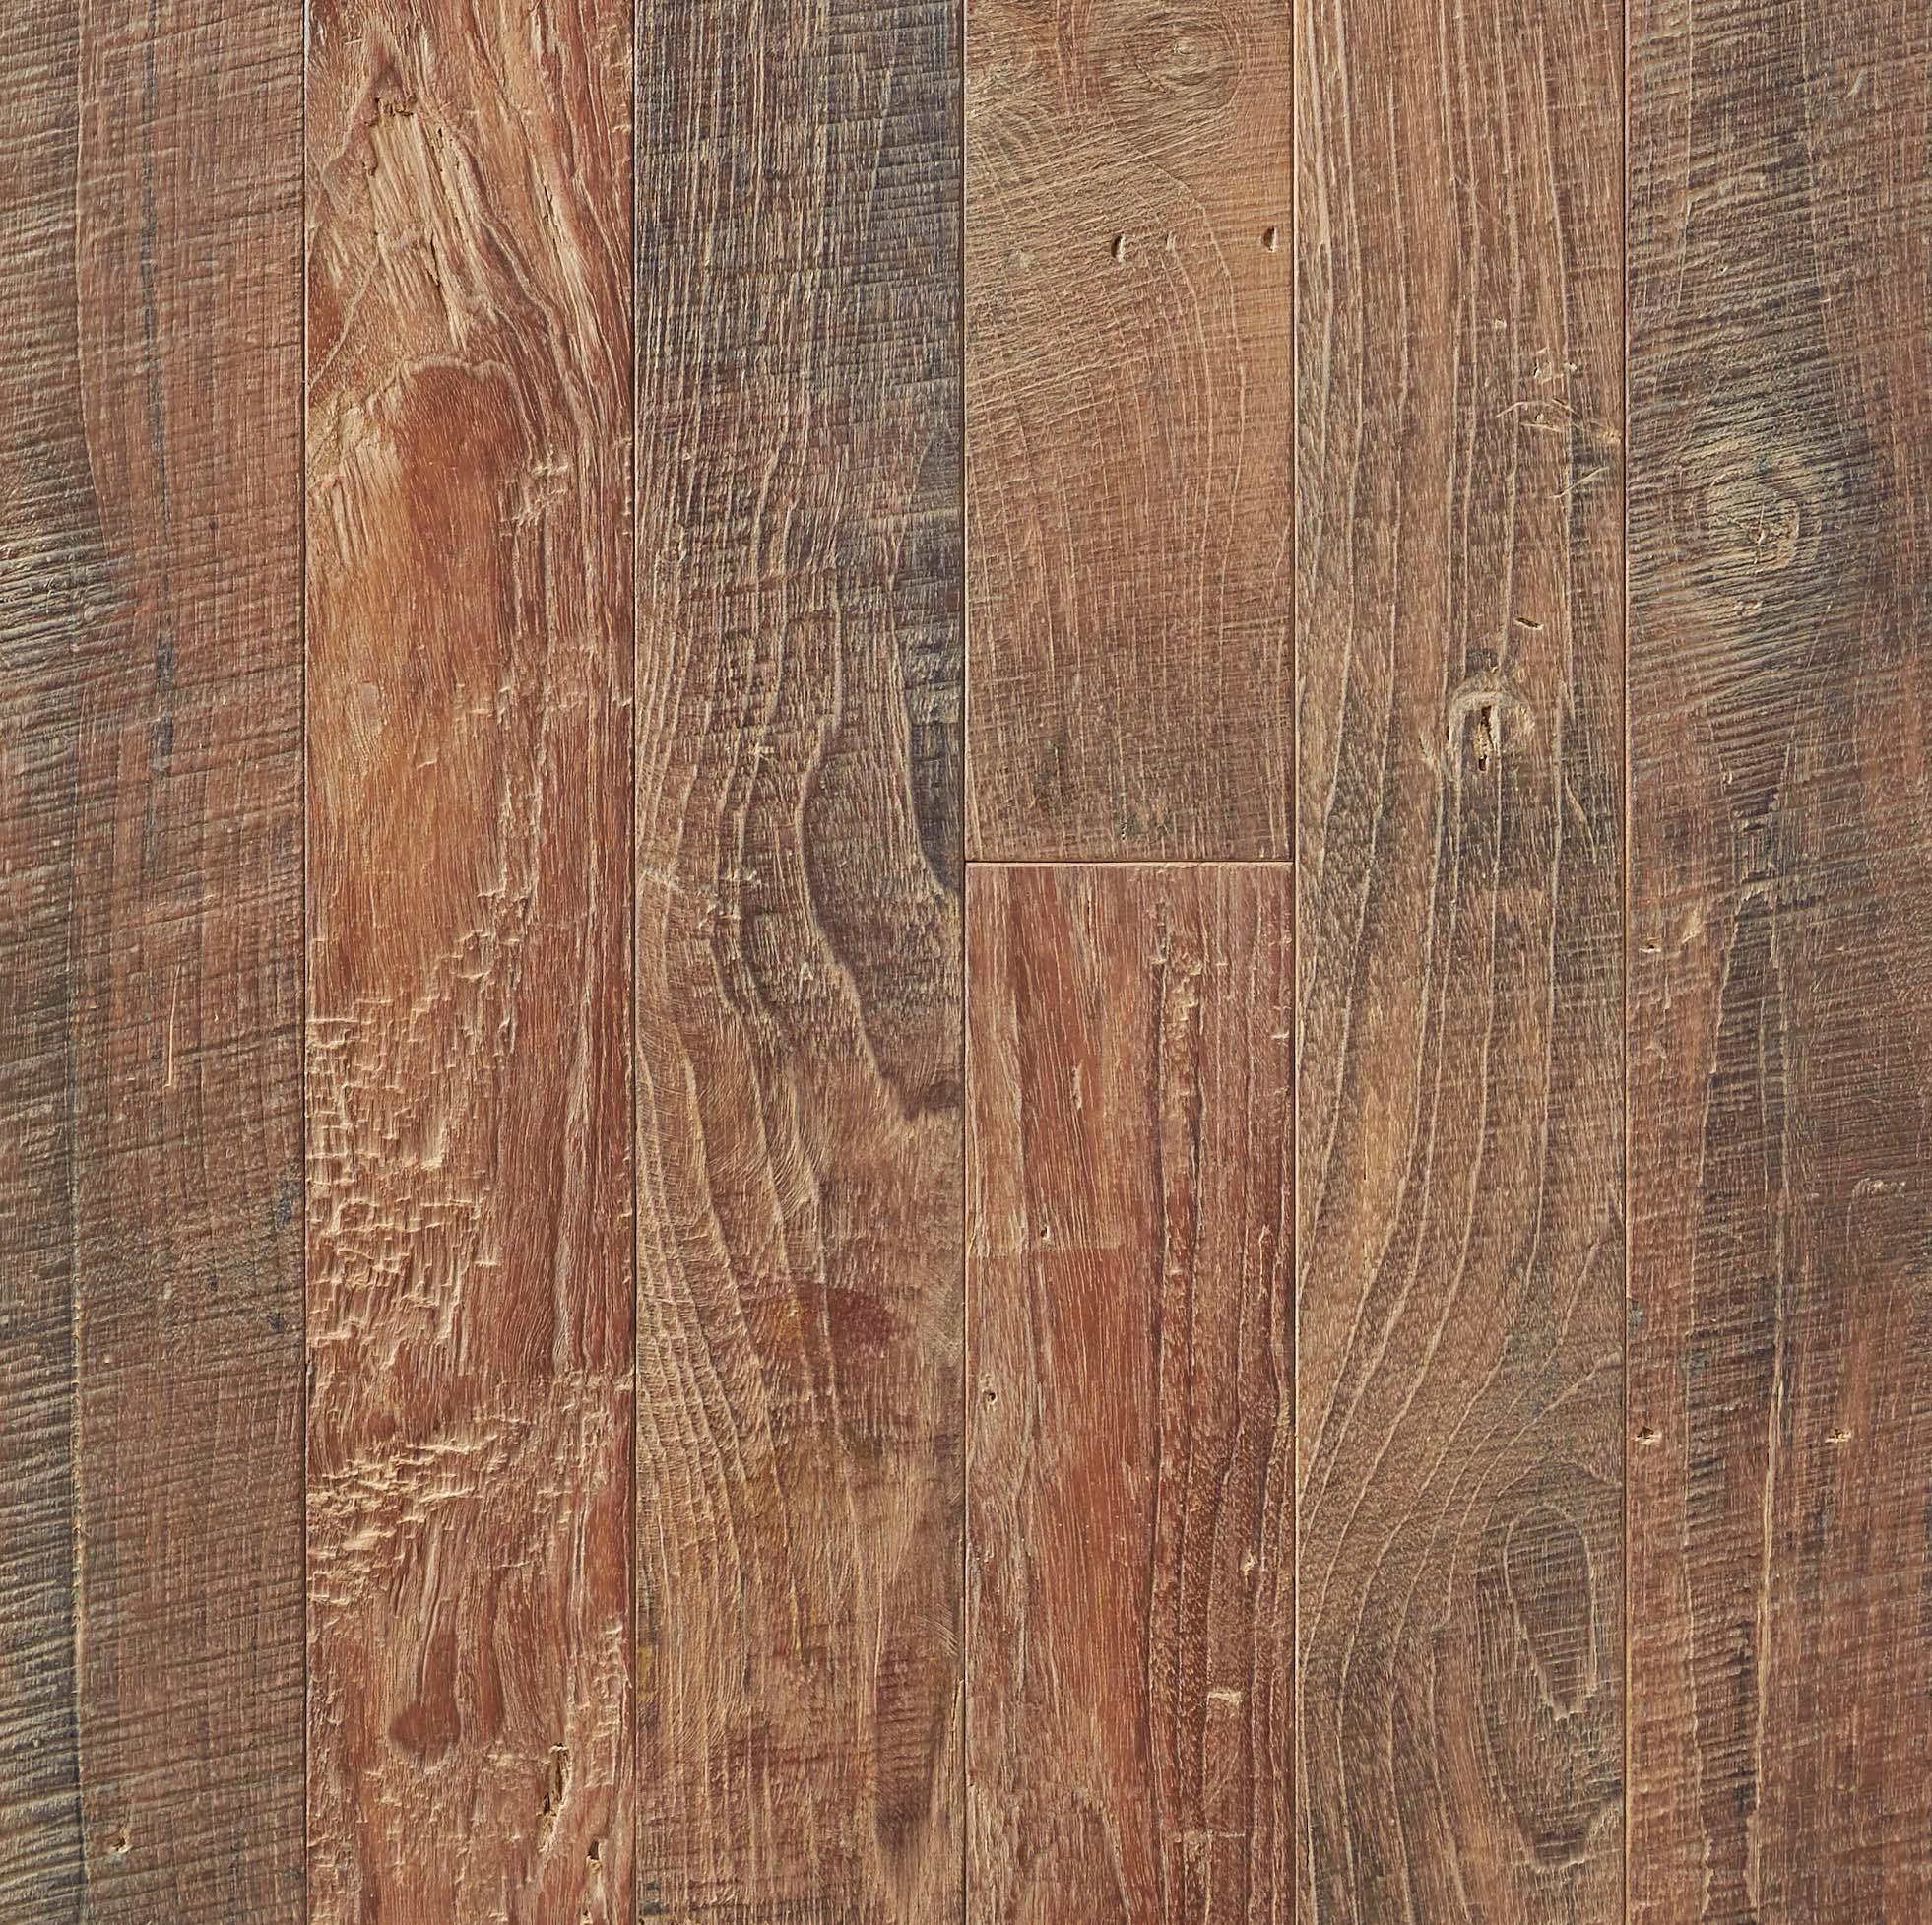 patina fog - Reclaimed Teak Flooring